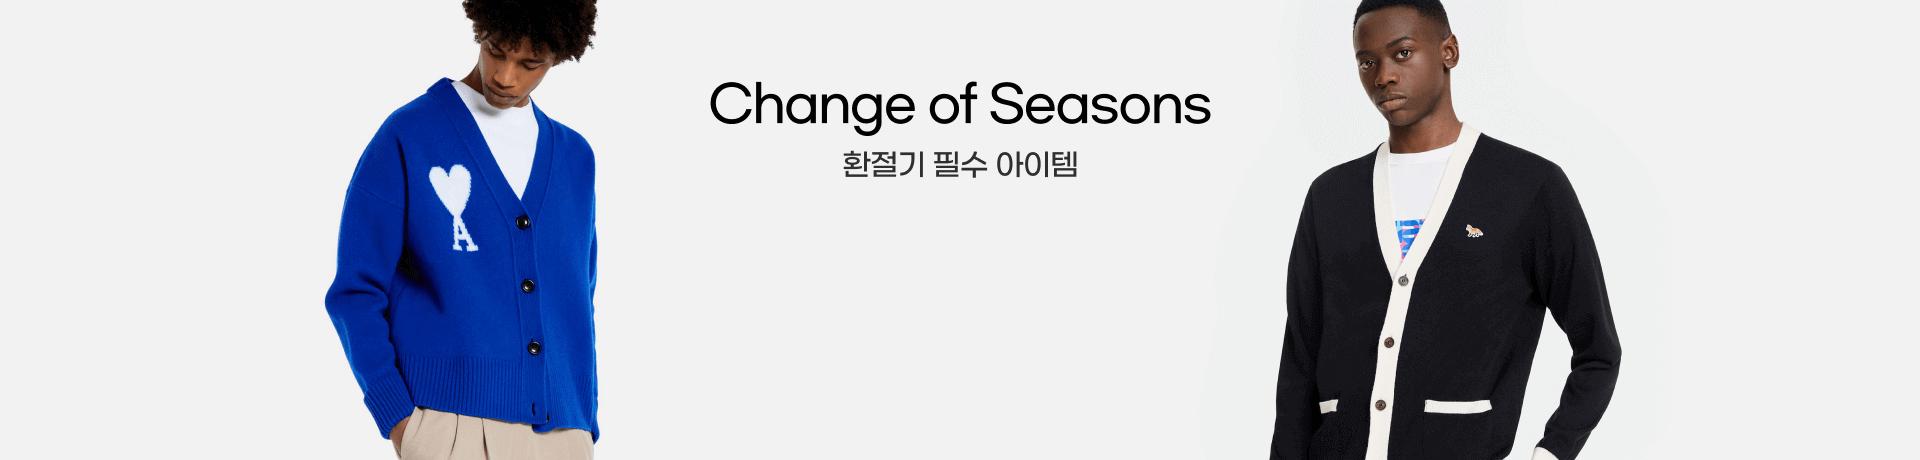 210927_sy_change-of-seasons_pc_f2f2f2